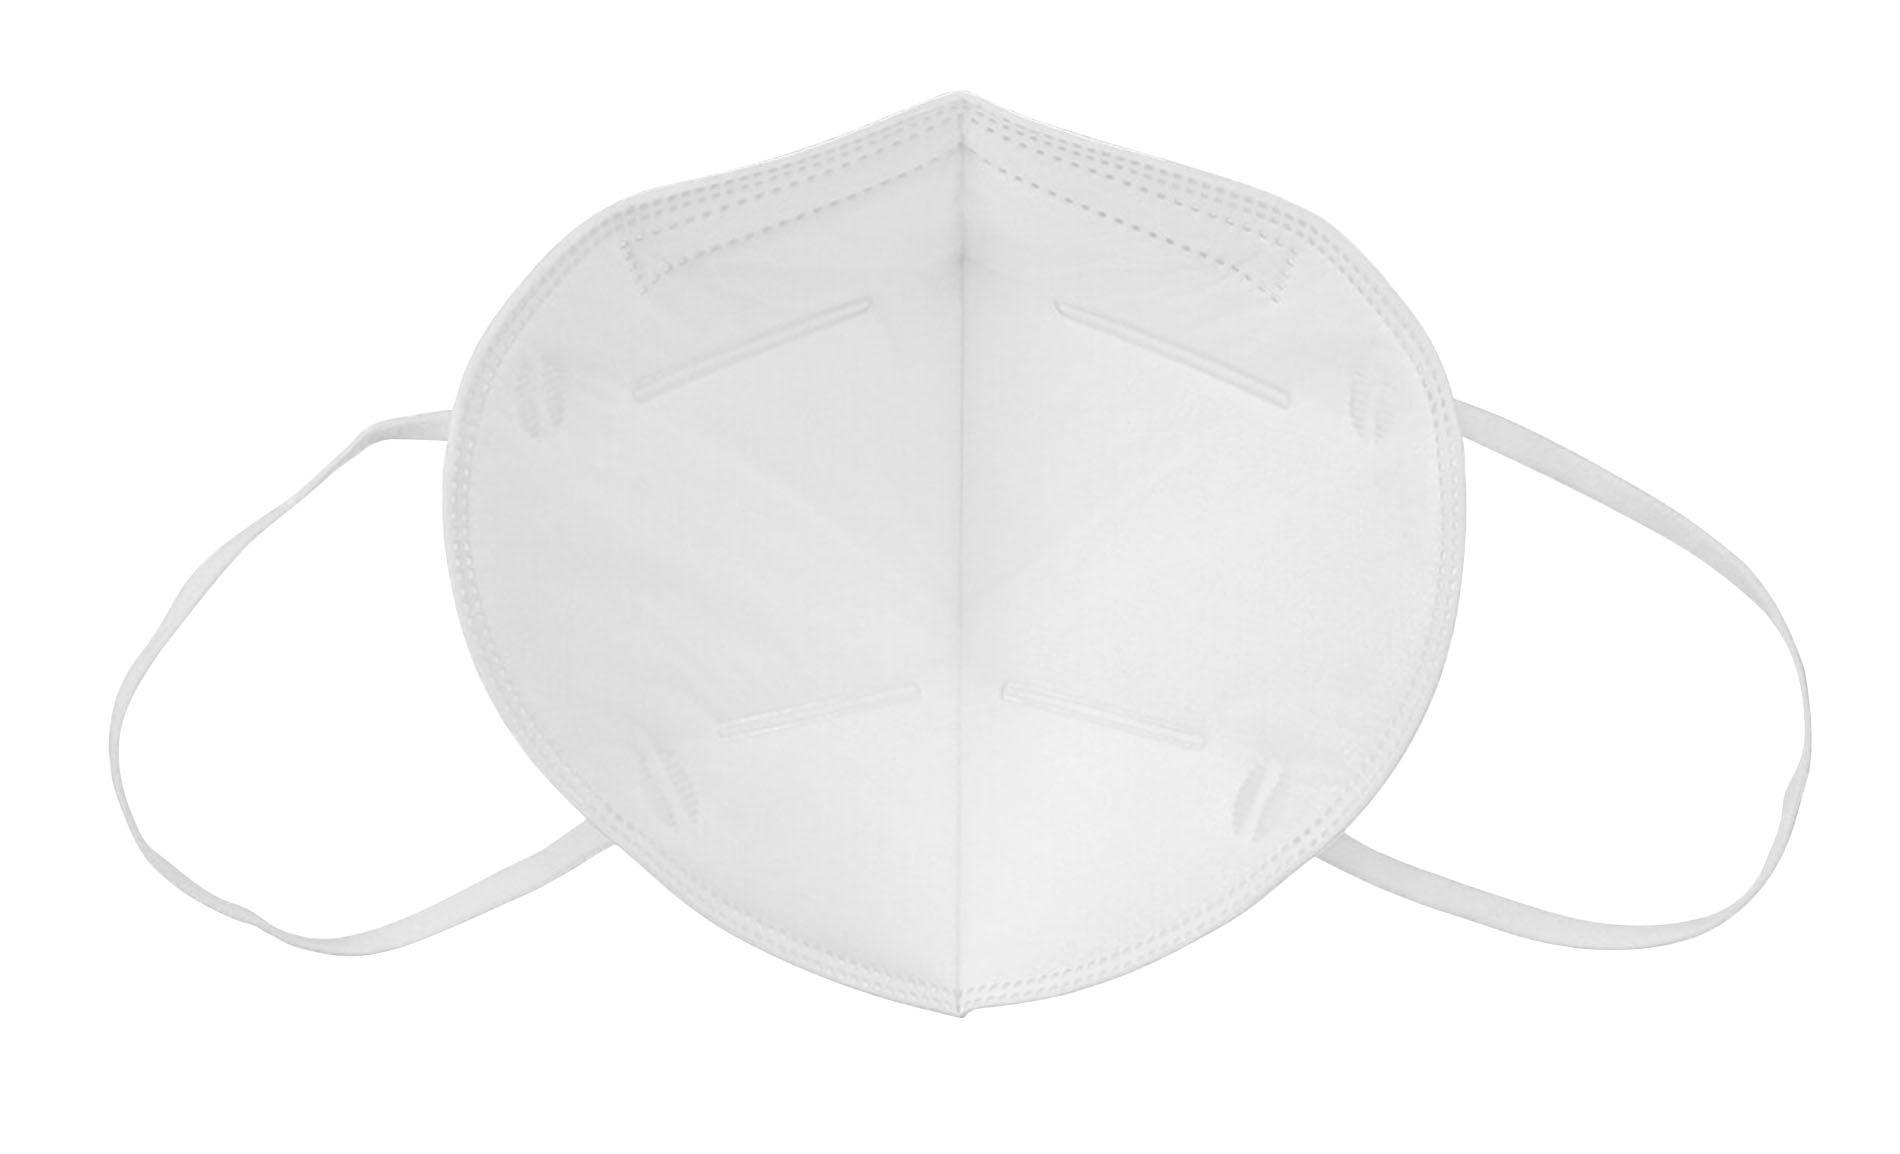 Ochranná maska FFP2 KN95 respirační rouška